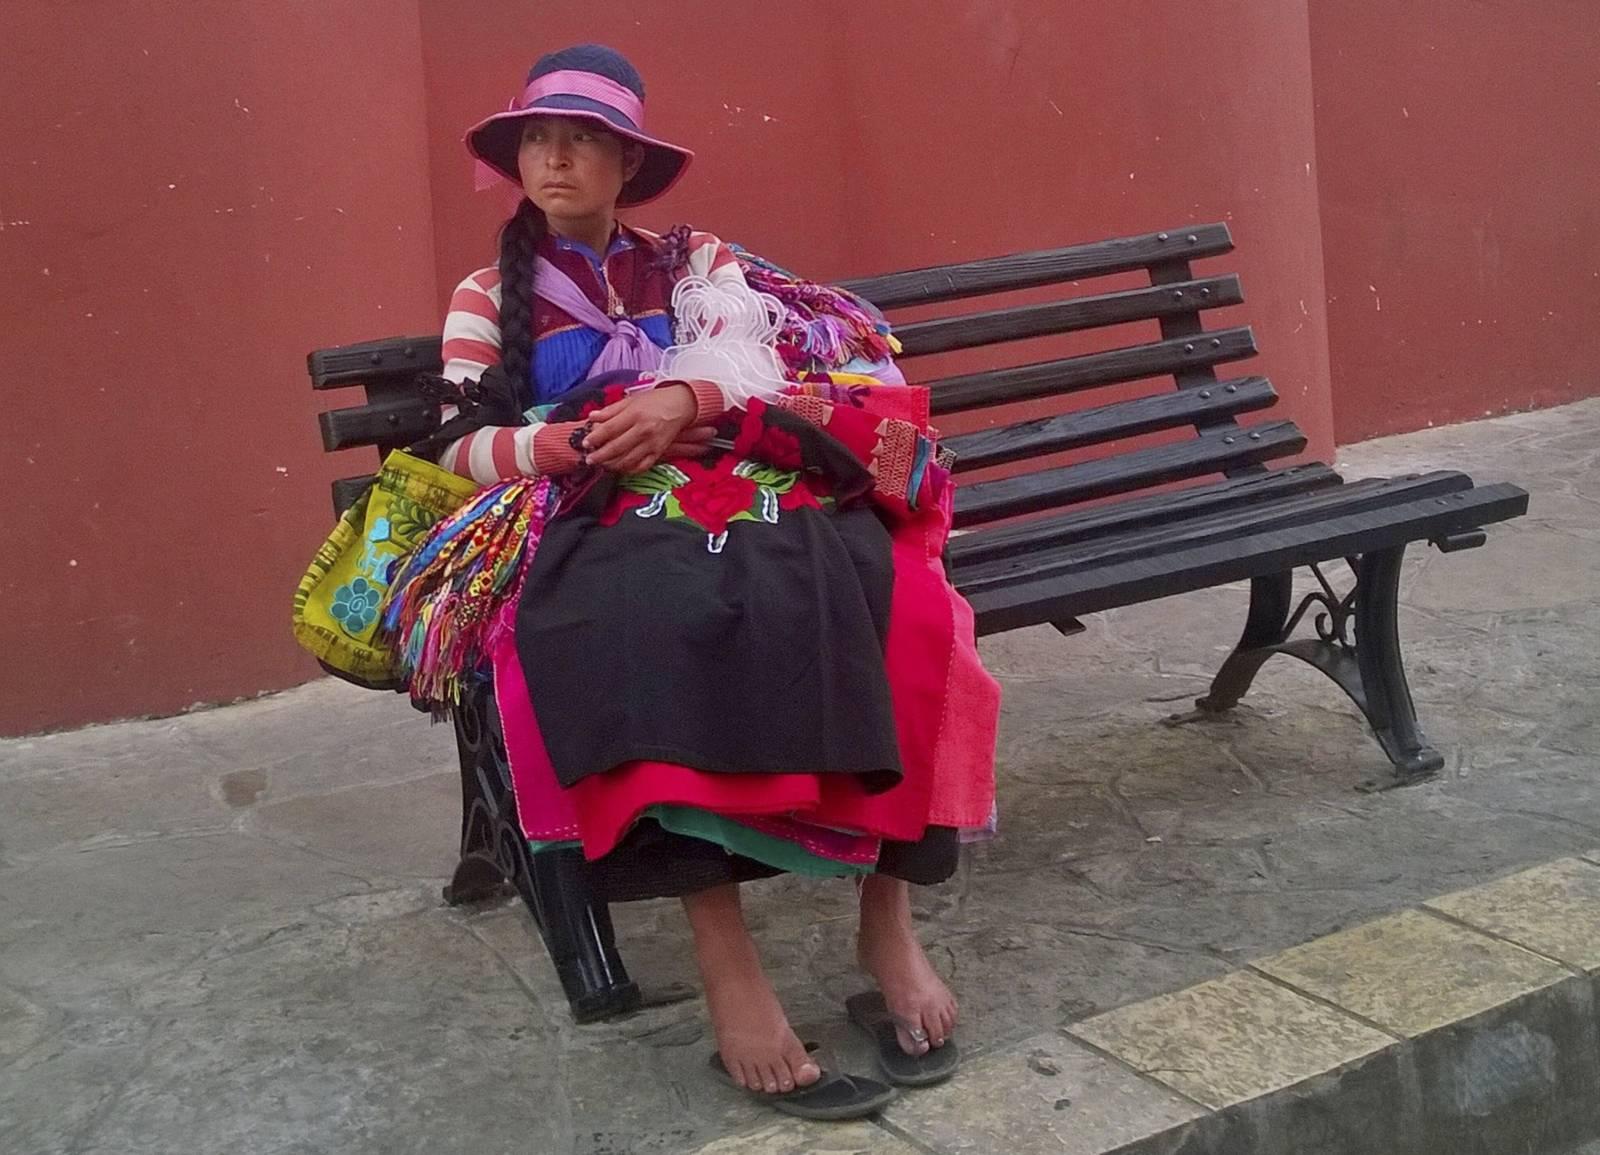 Messico-mexico-san-cristobal-de-las-casas-chiapas